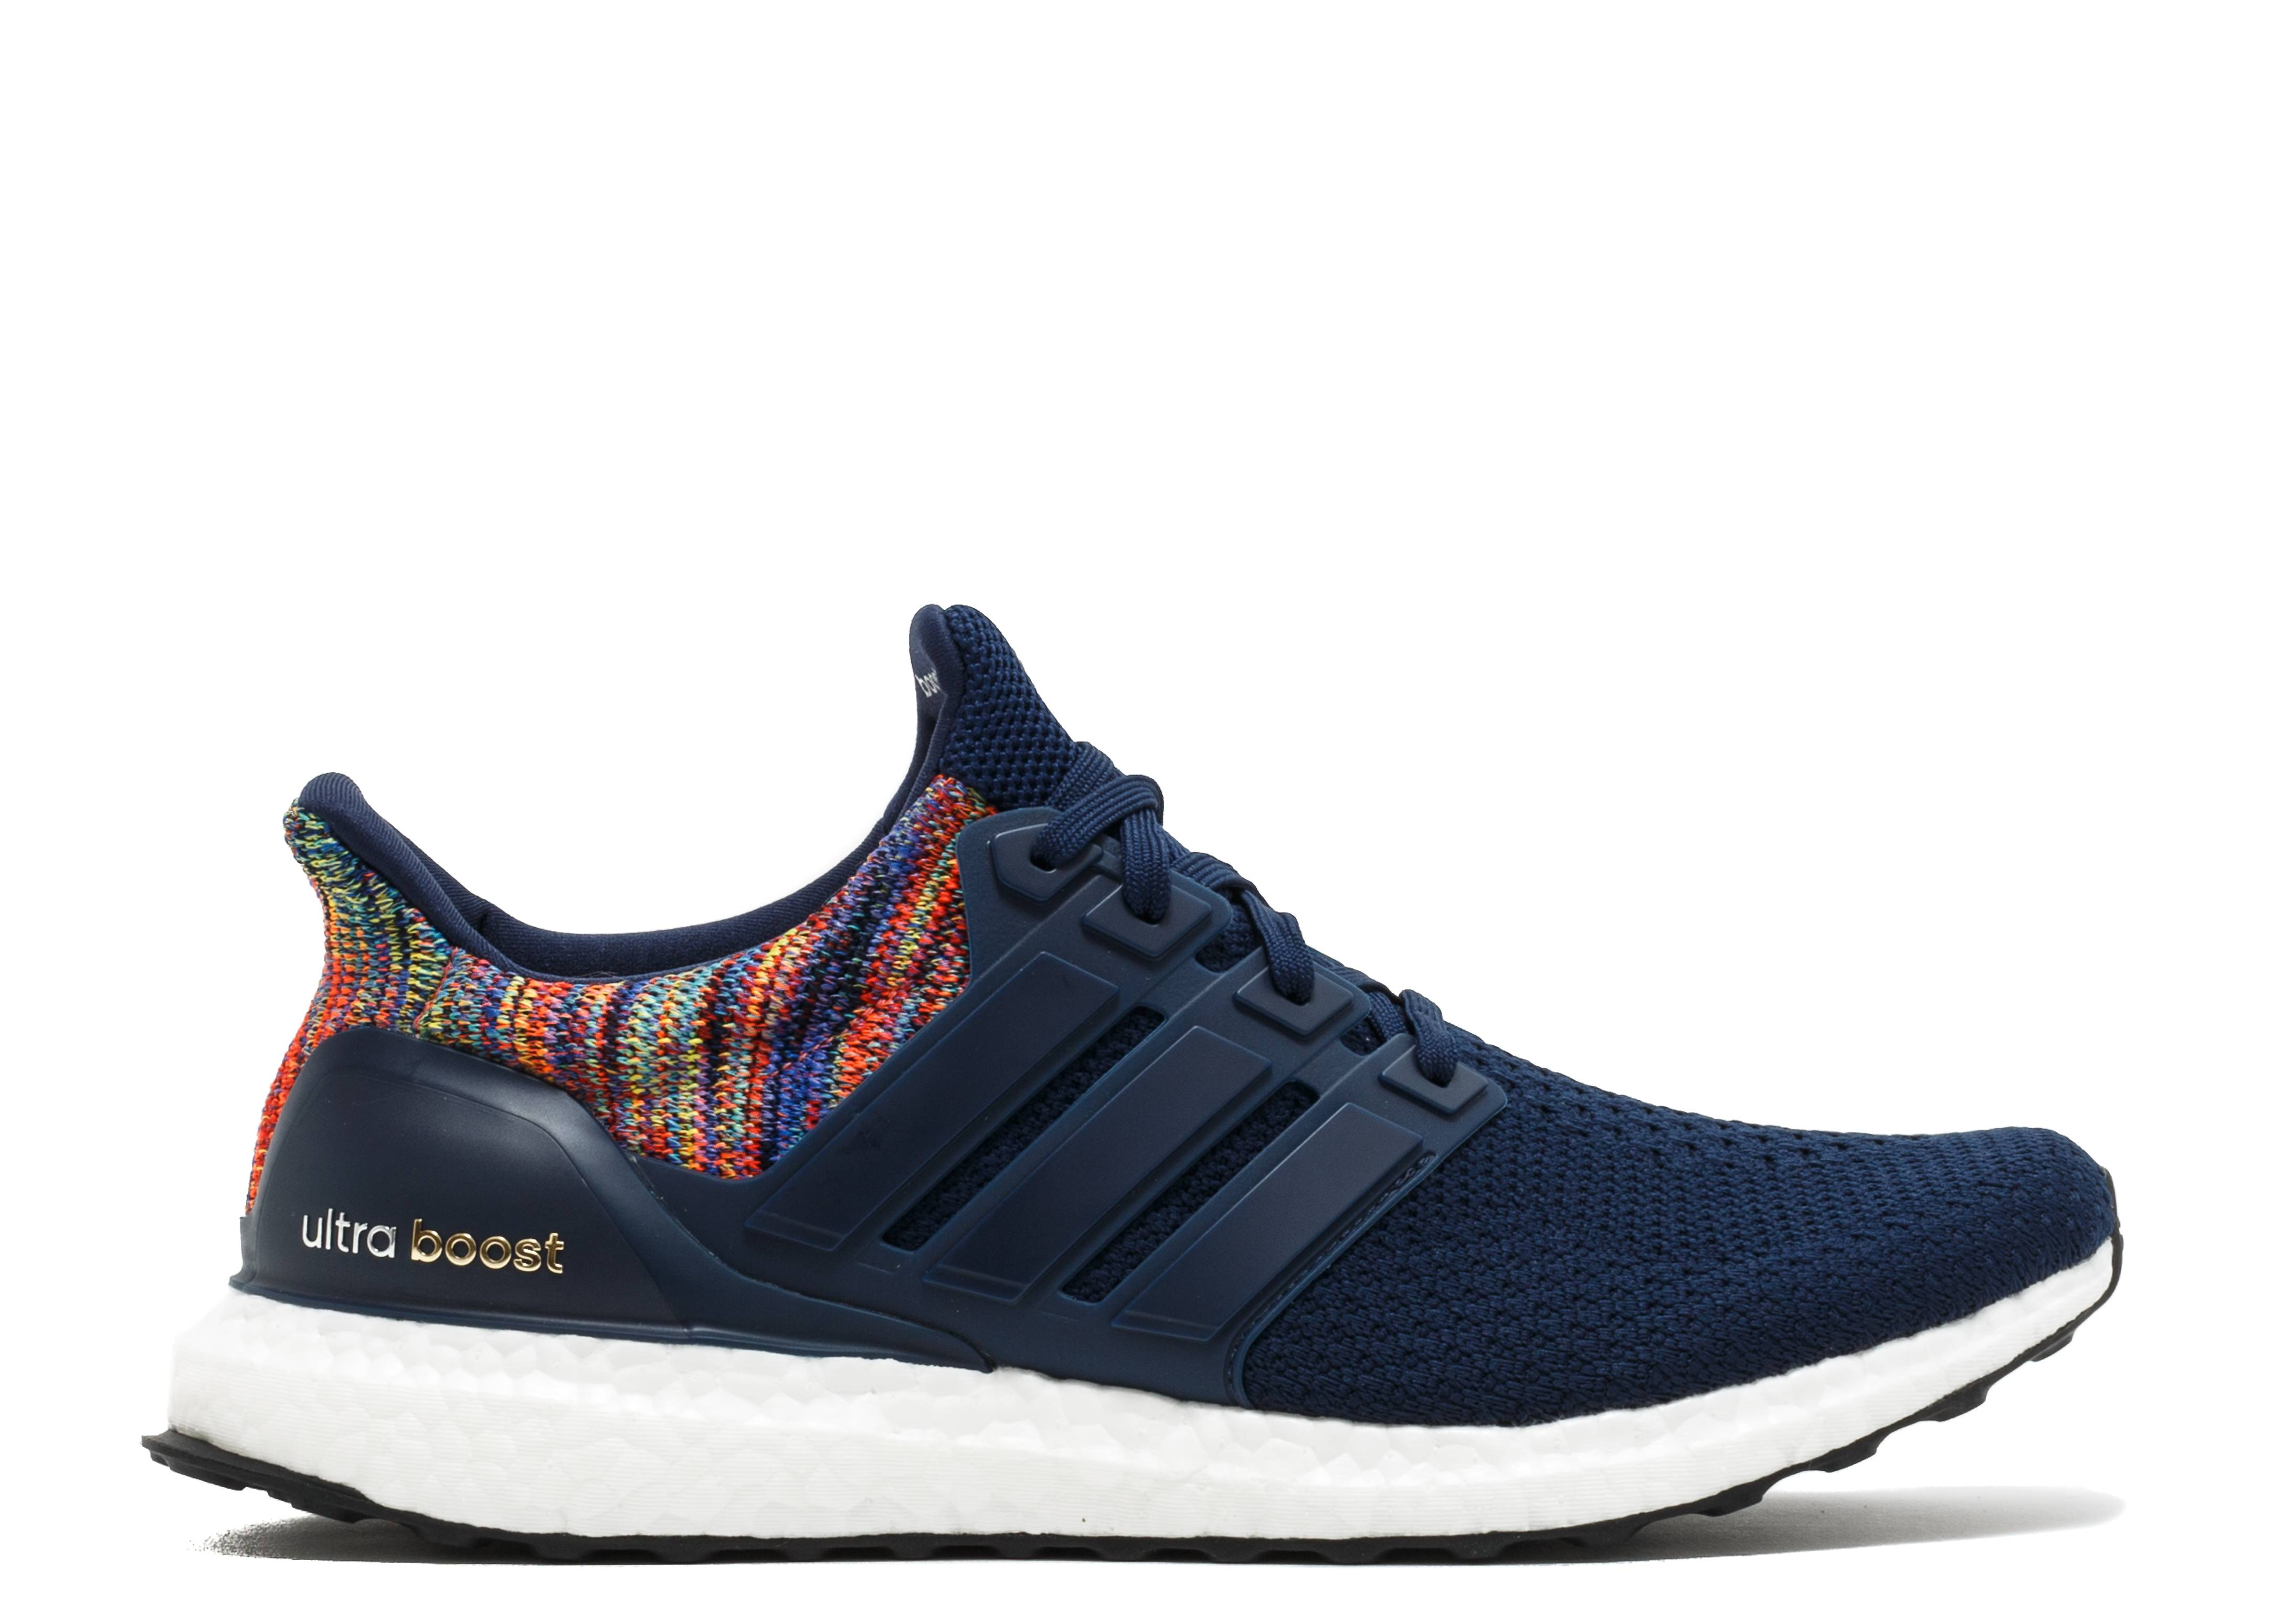 7a4bac236b6c Ultra Boost 2.0 - Adidas - by1756 - core blue  multi